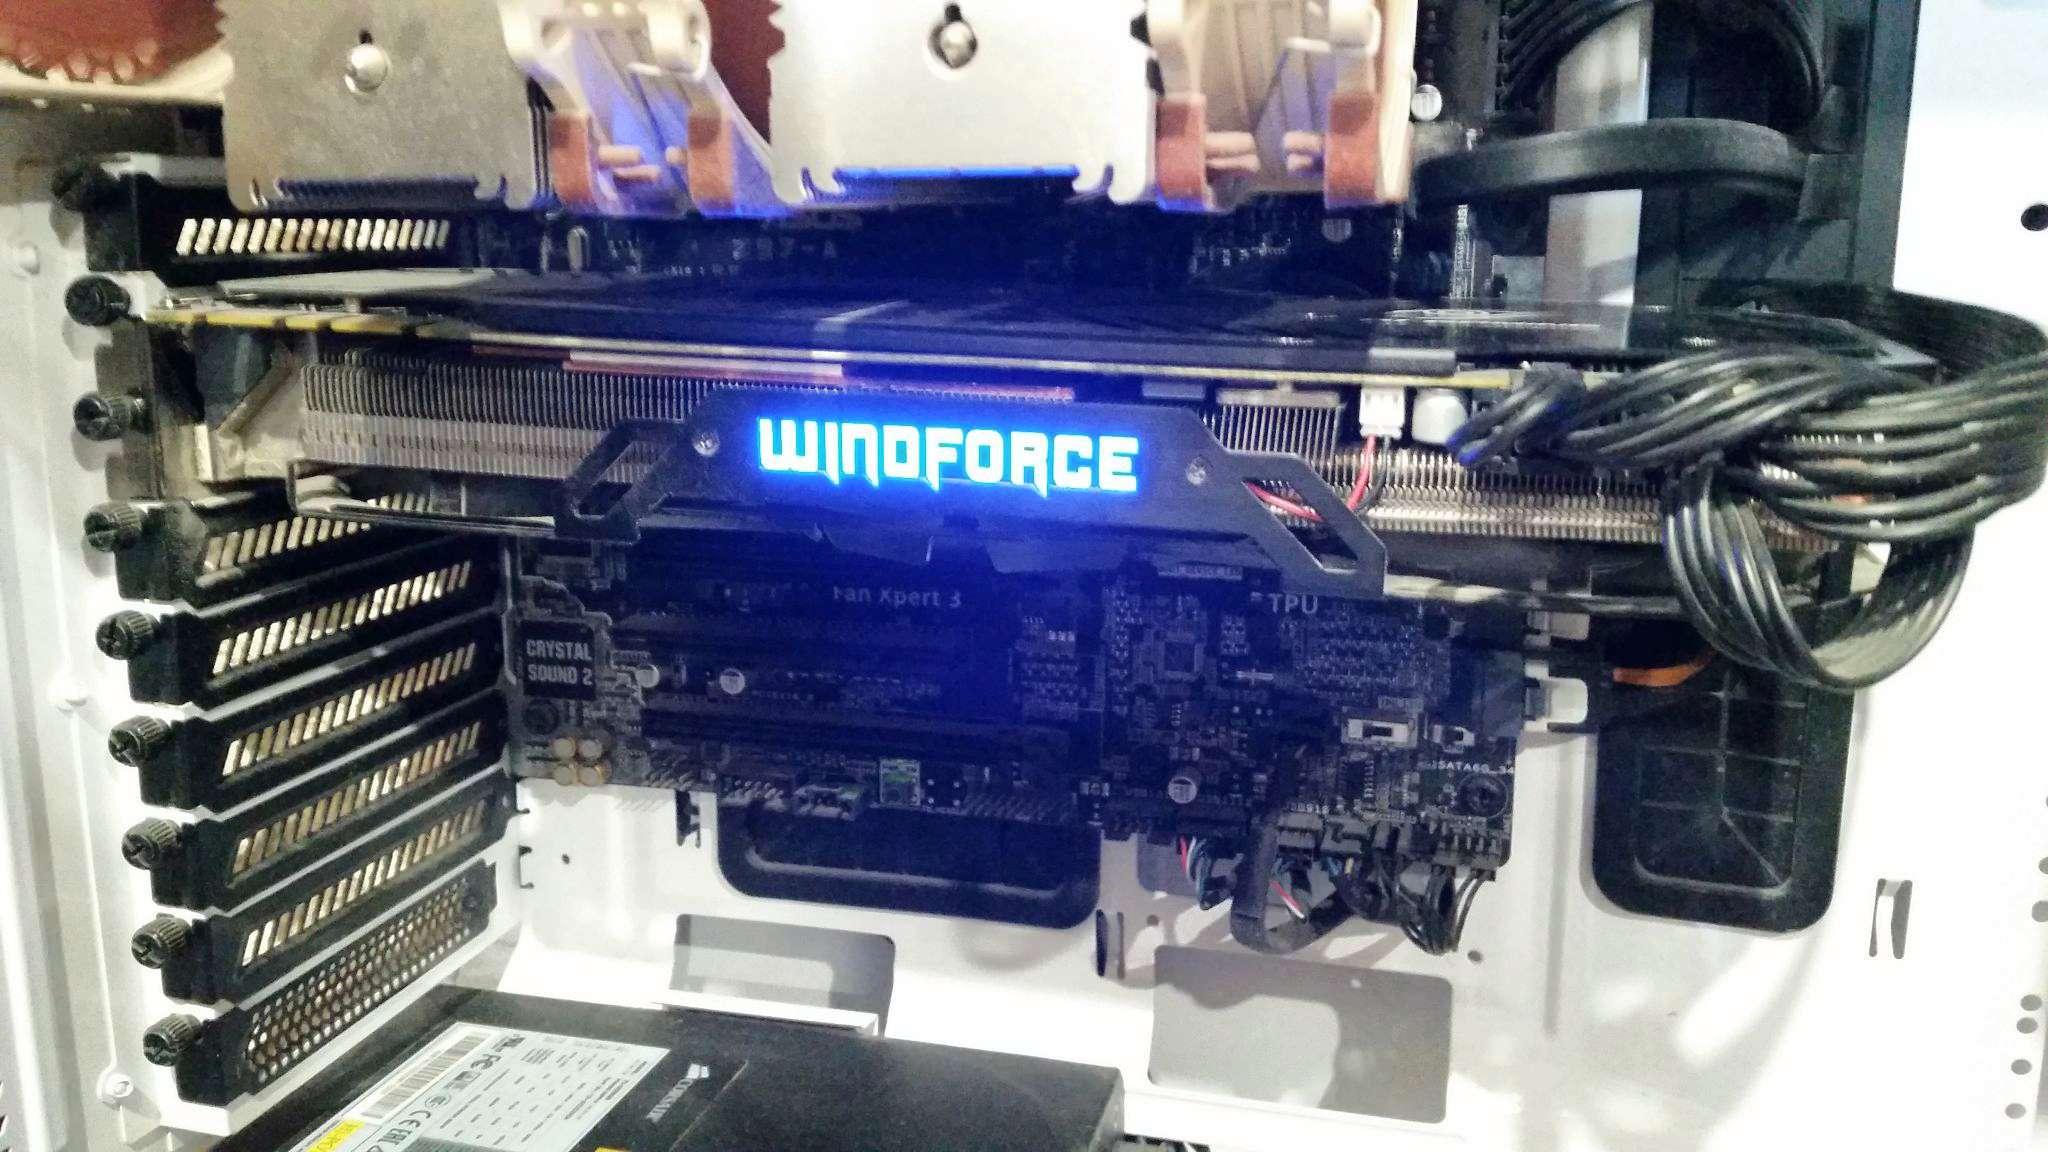 Видеокарта GIGABYTE GeForce GTX 980 1228Mhz PCI-E 3 0 4096Mb 7000Mhz 256  bit 2xDVI HDMI HDCP (G1 Gaming)